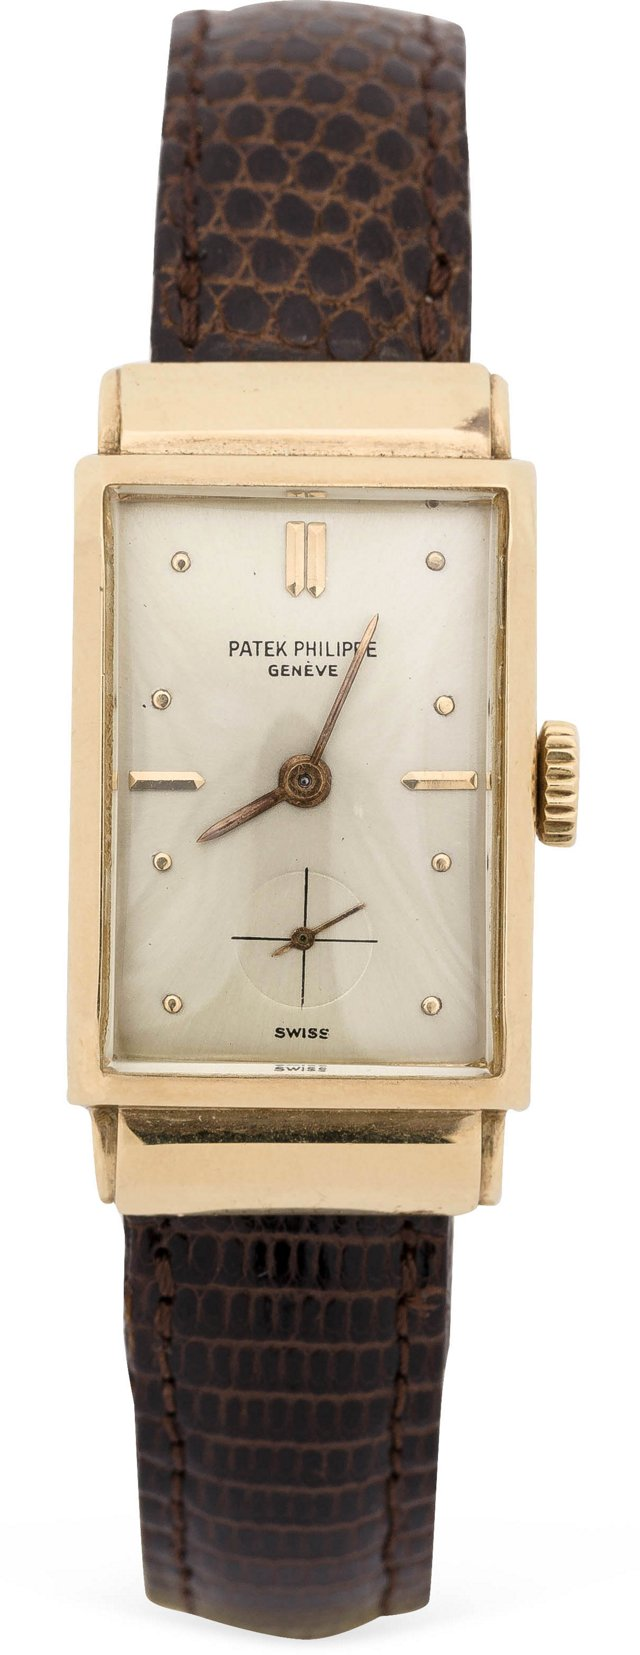 Vintage 18K Gold Patek Philippe